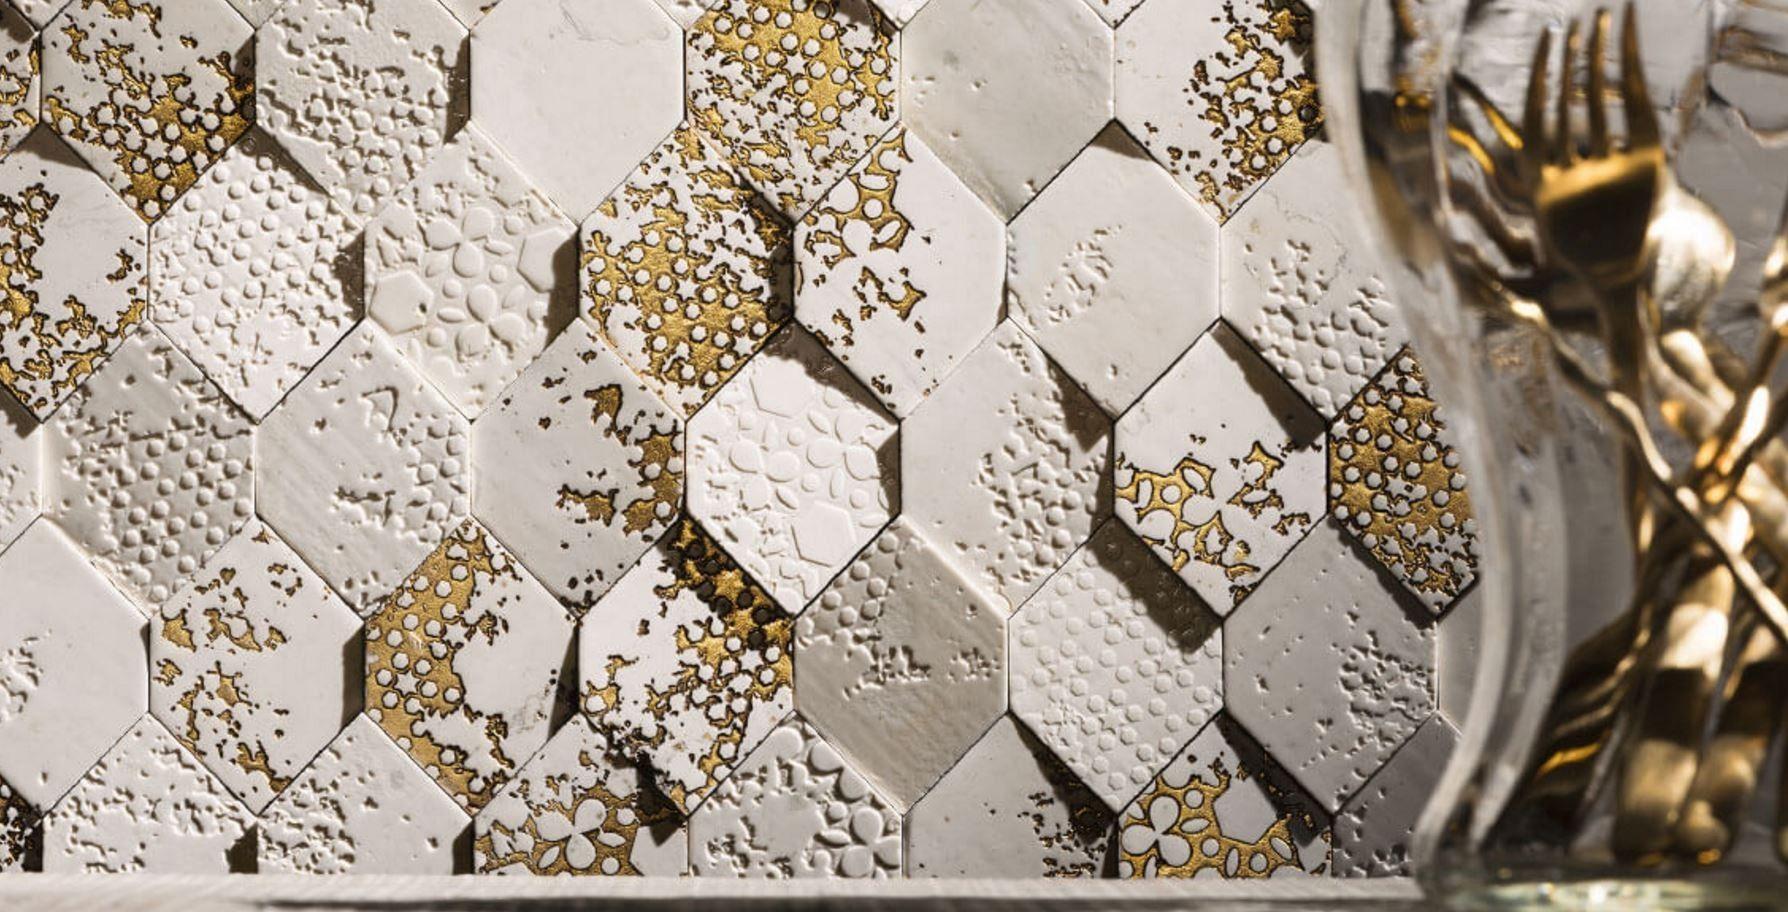 Pietre darredo petra antiqua acqueforti mosaics ral ceramiche